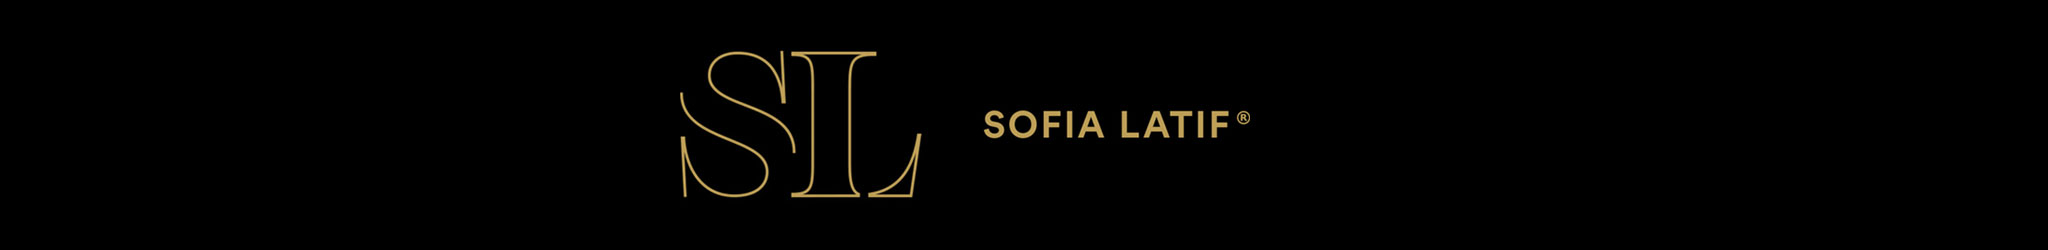 SOFIA LATIF®